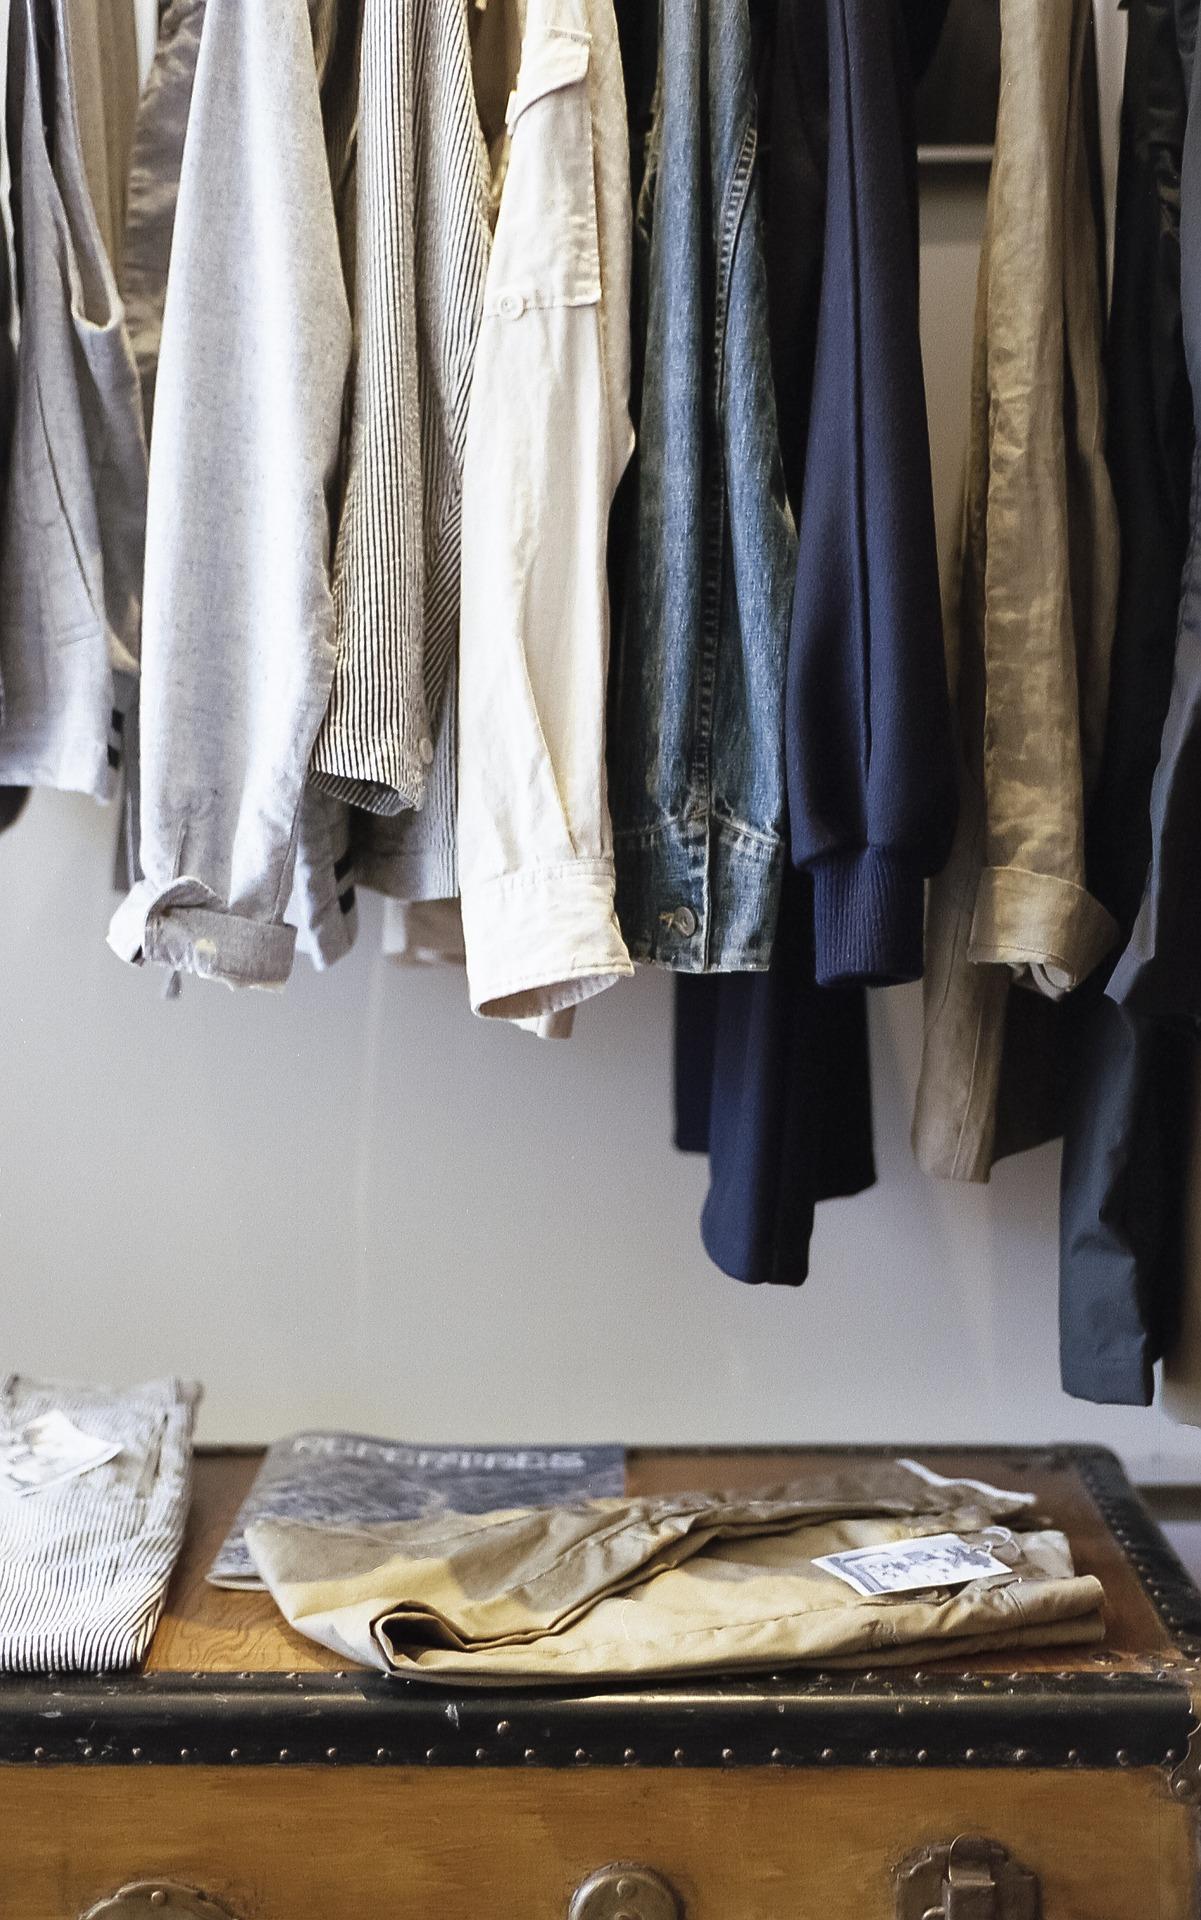 closet-1209917_1920.jpg